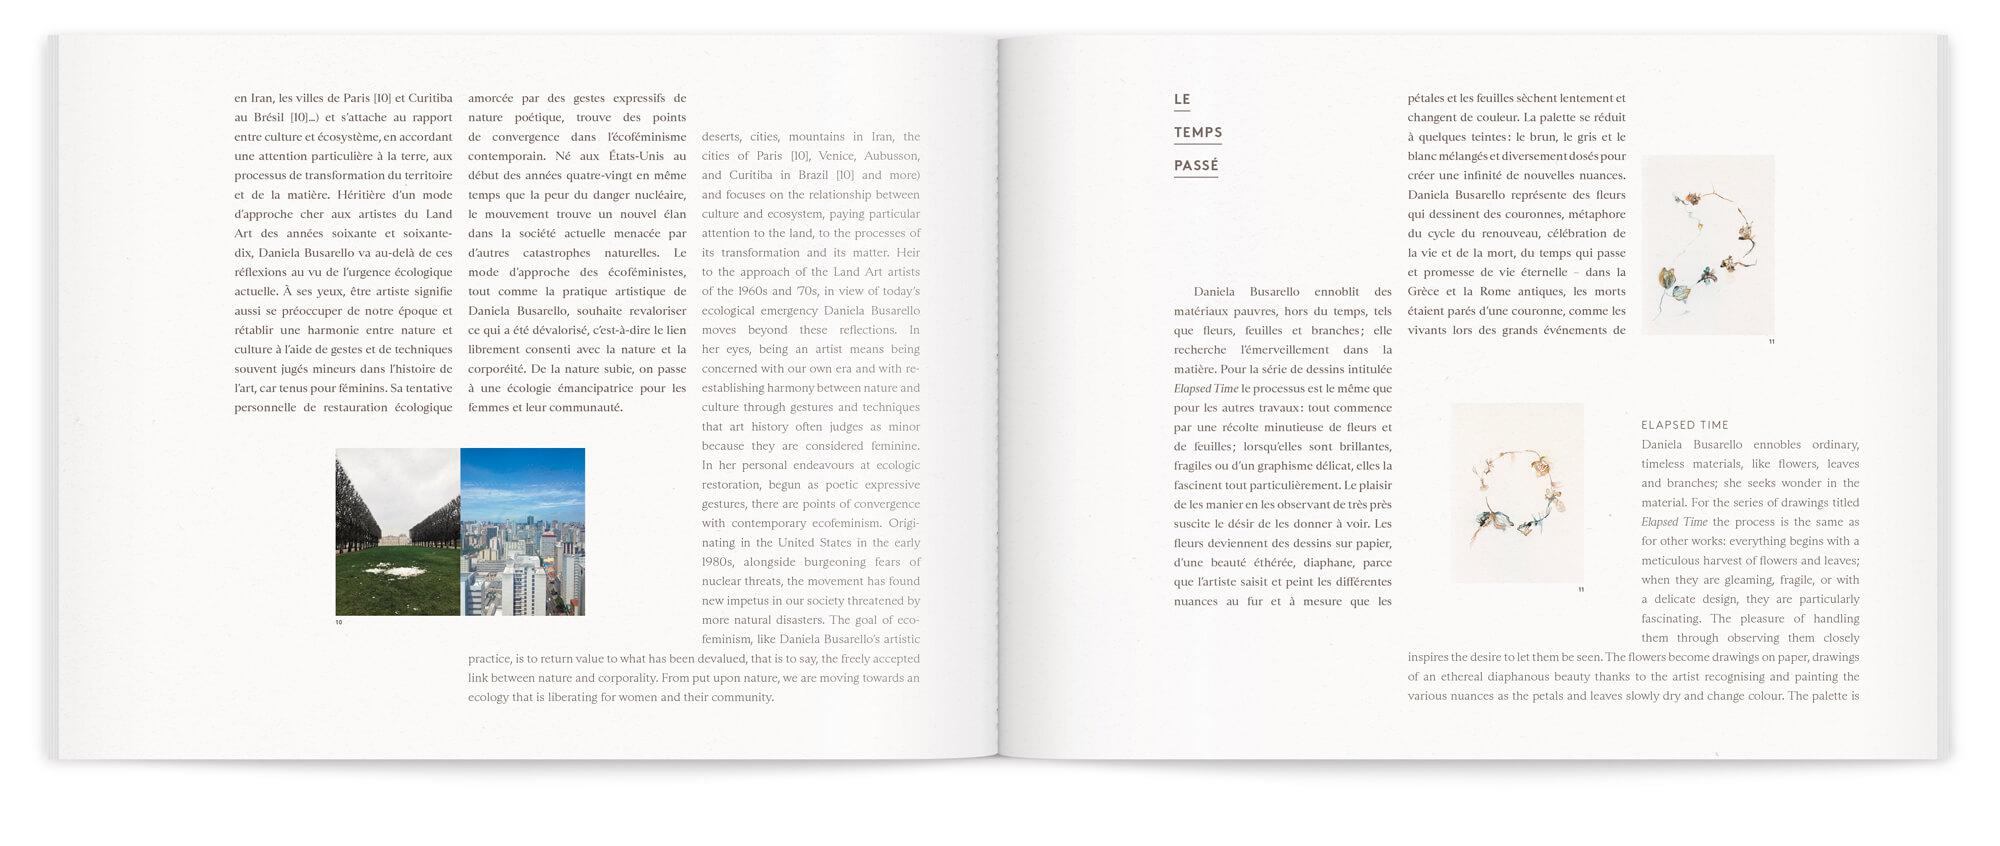 daniela-busarello-vida-livret-le-temps-passe-ichetkar